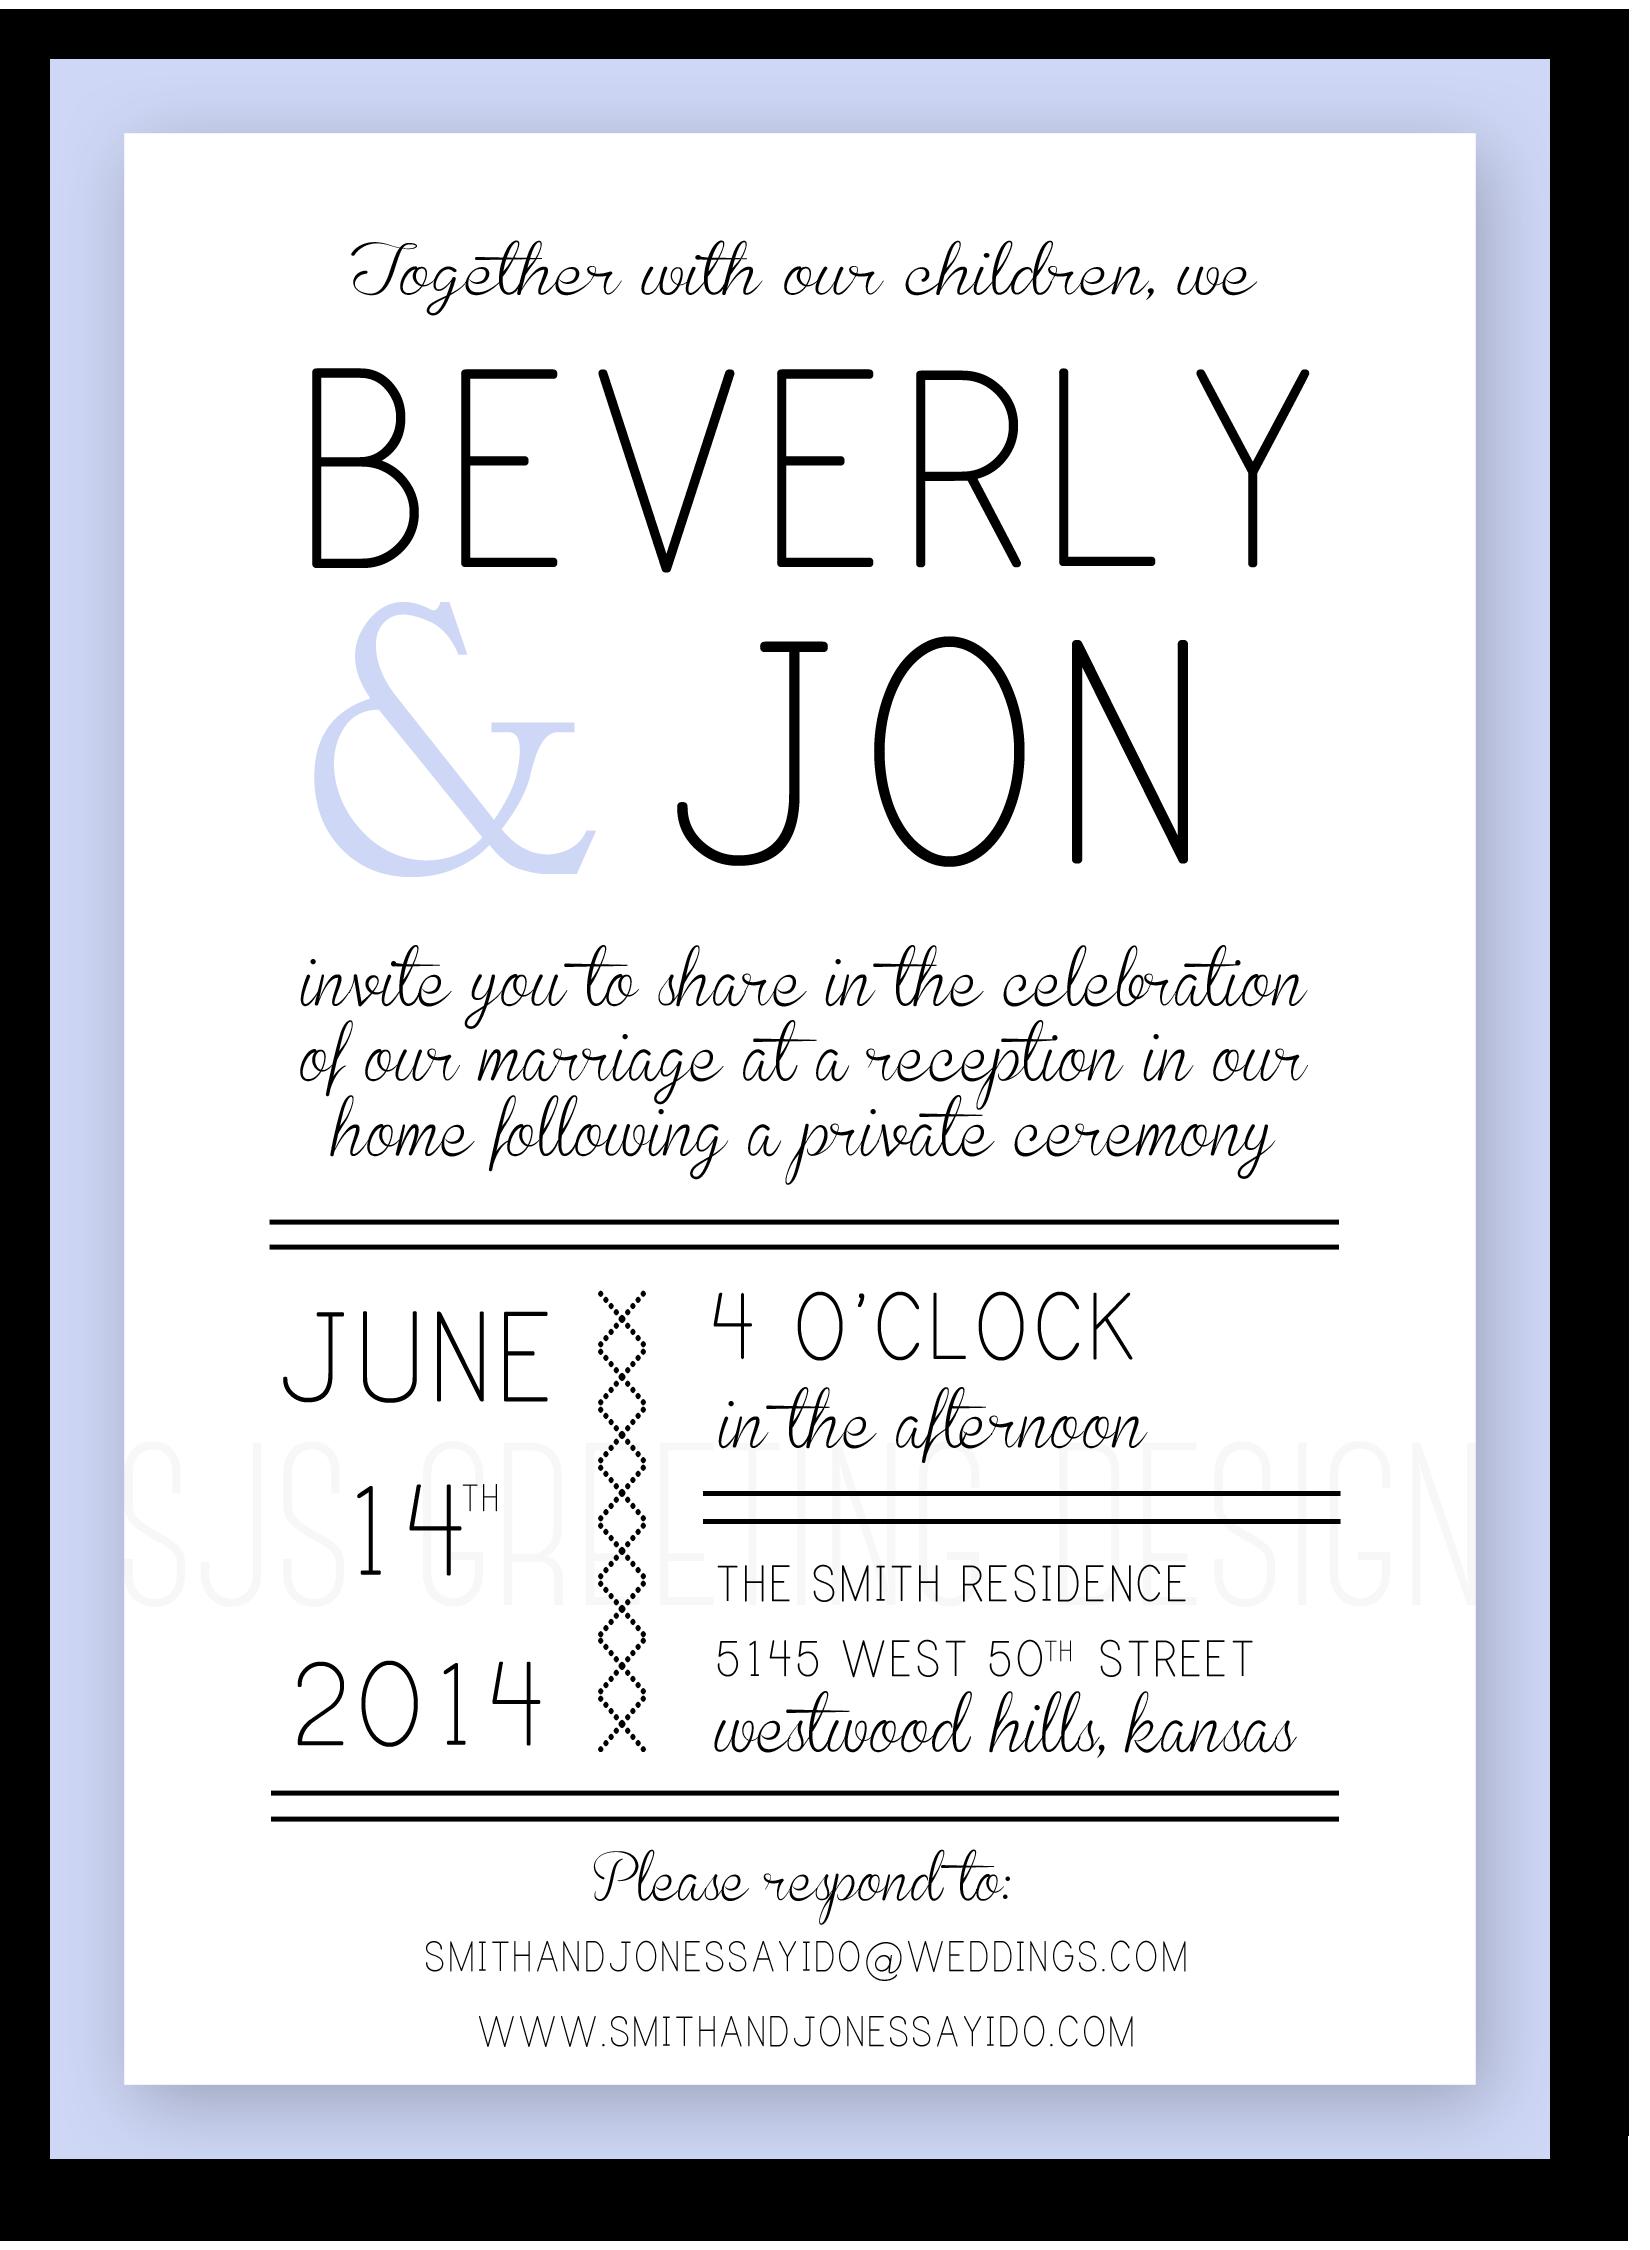 Custom Casual Wedding Invitation Beverly Sjsgreetingdesign